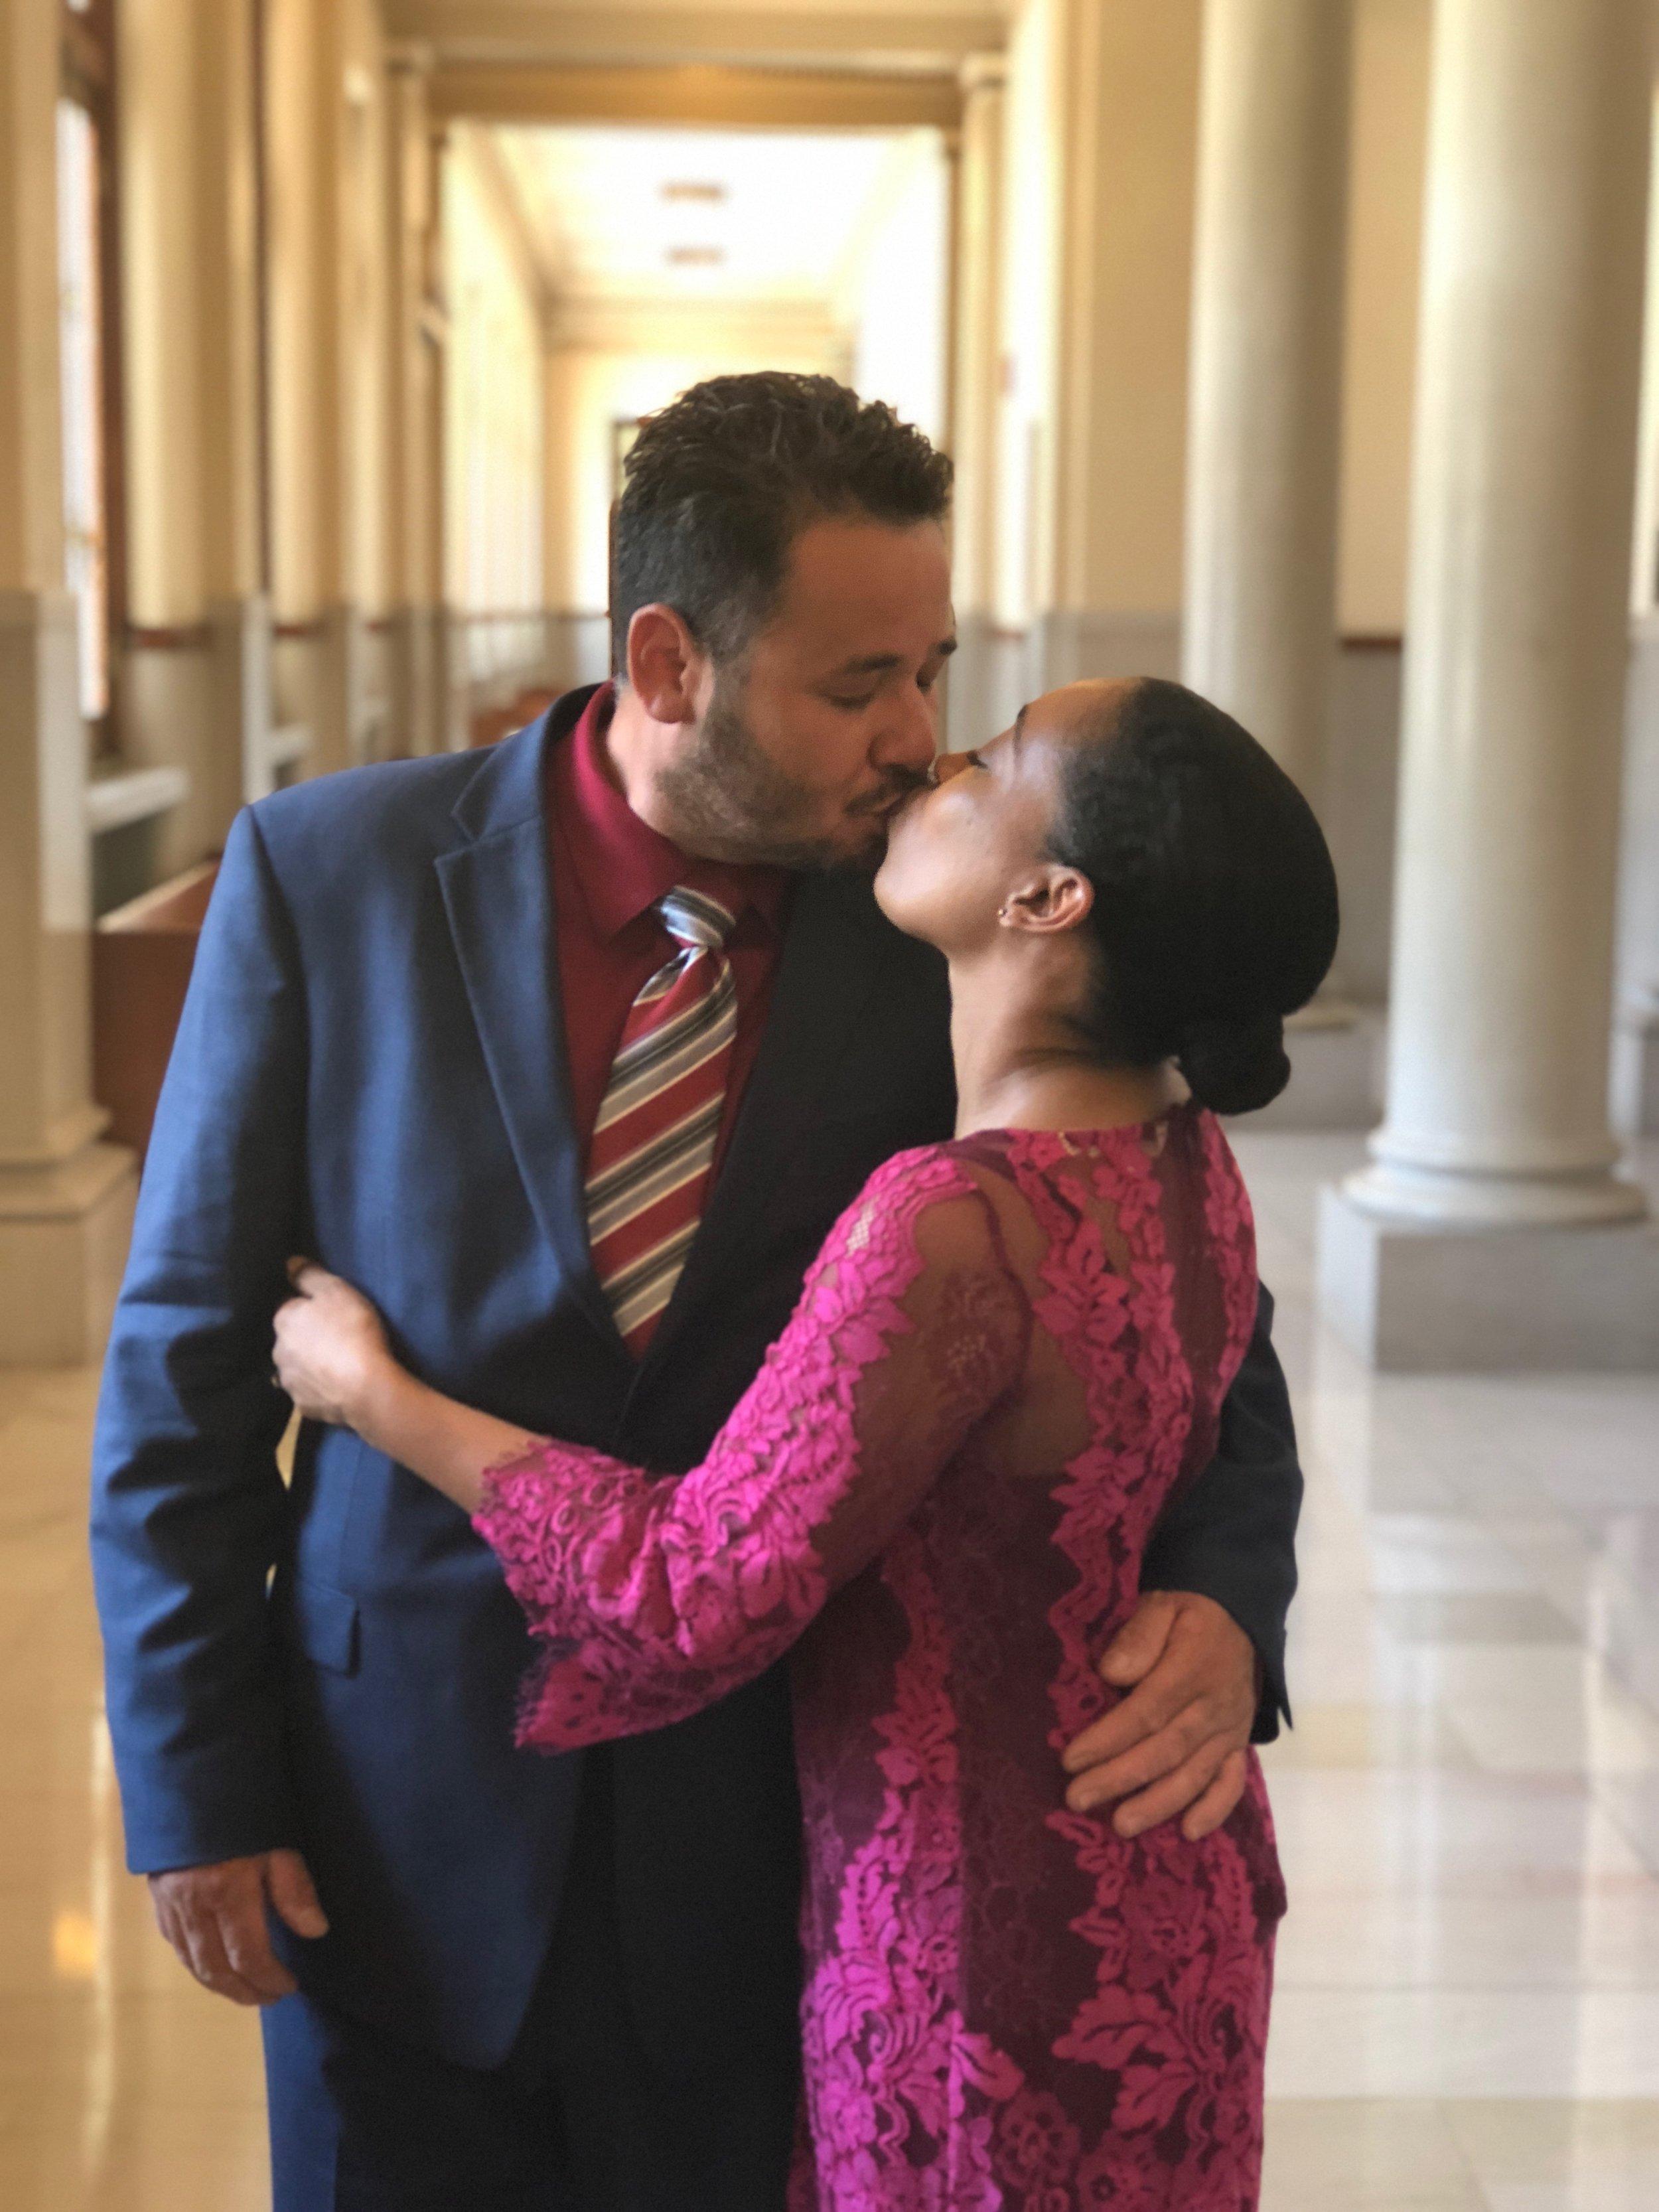 Andrea Fenise Memphis Fashion Blogger celebrates National Spouse's Day